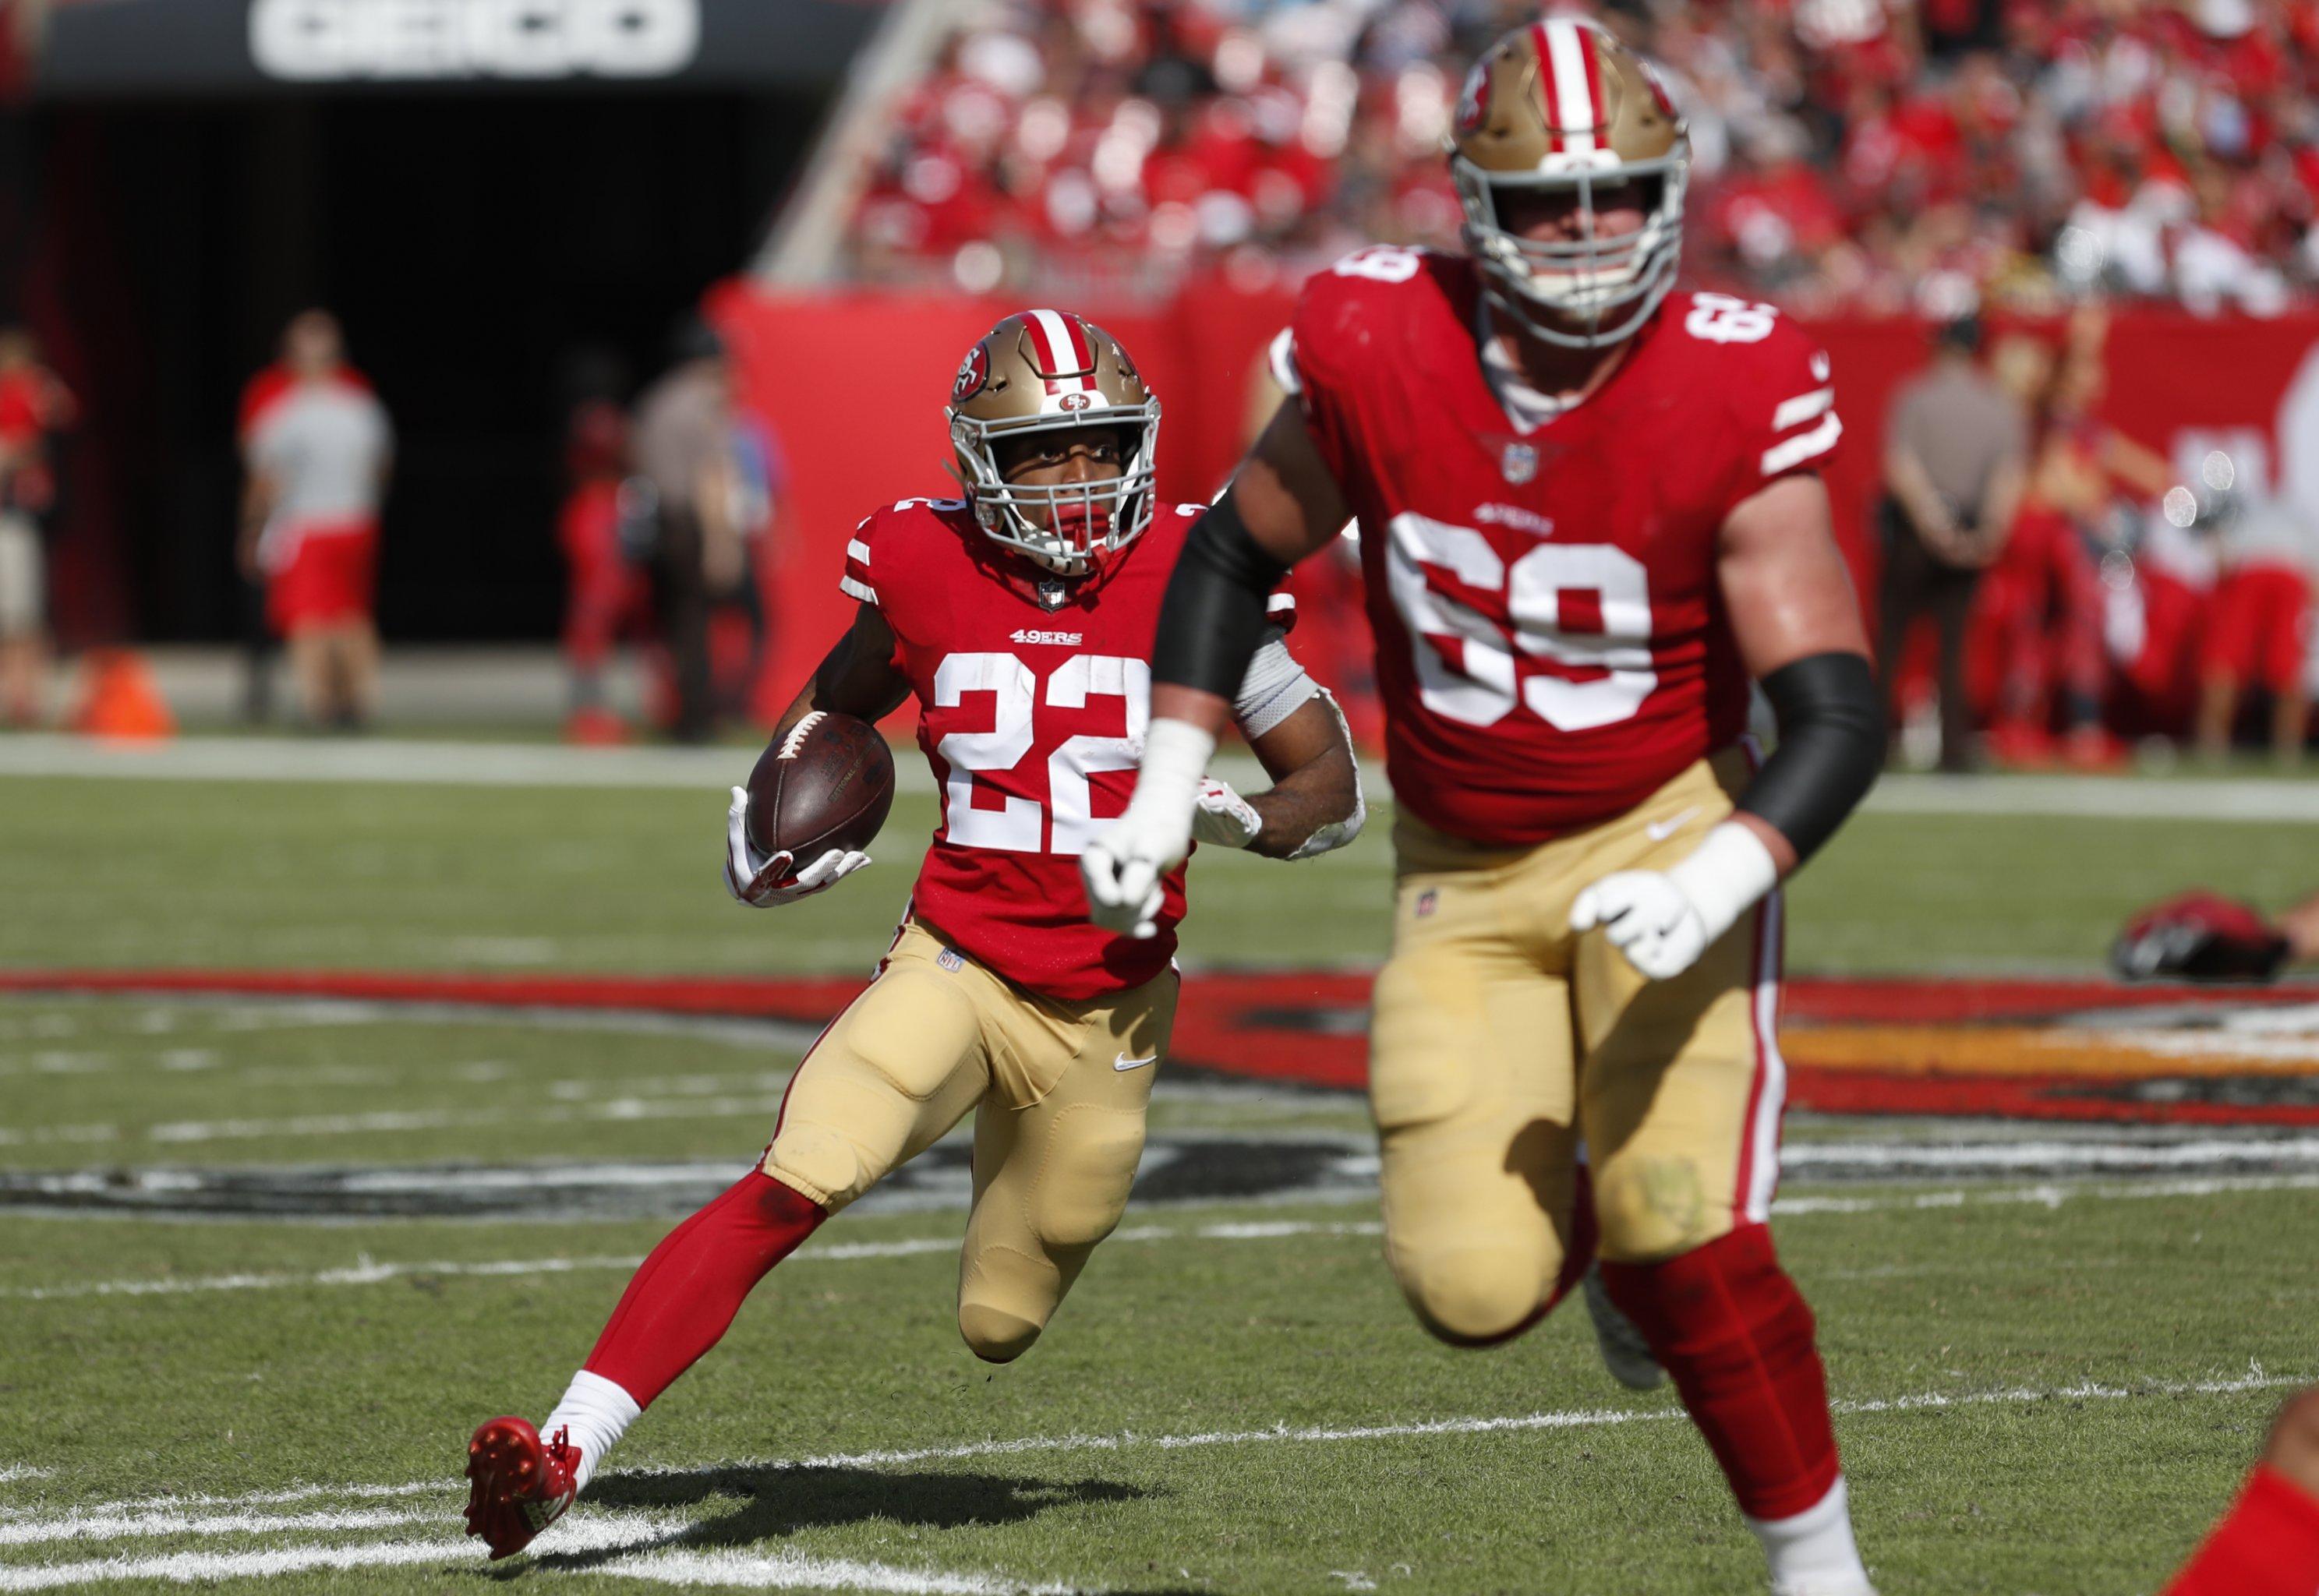 Grading Every NFL Team's 2018 Draft Haul | Bleacher Report